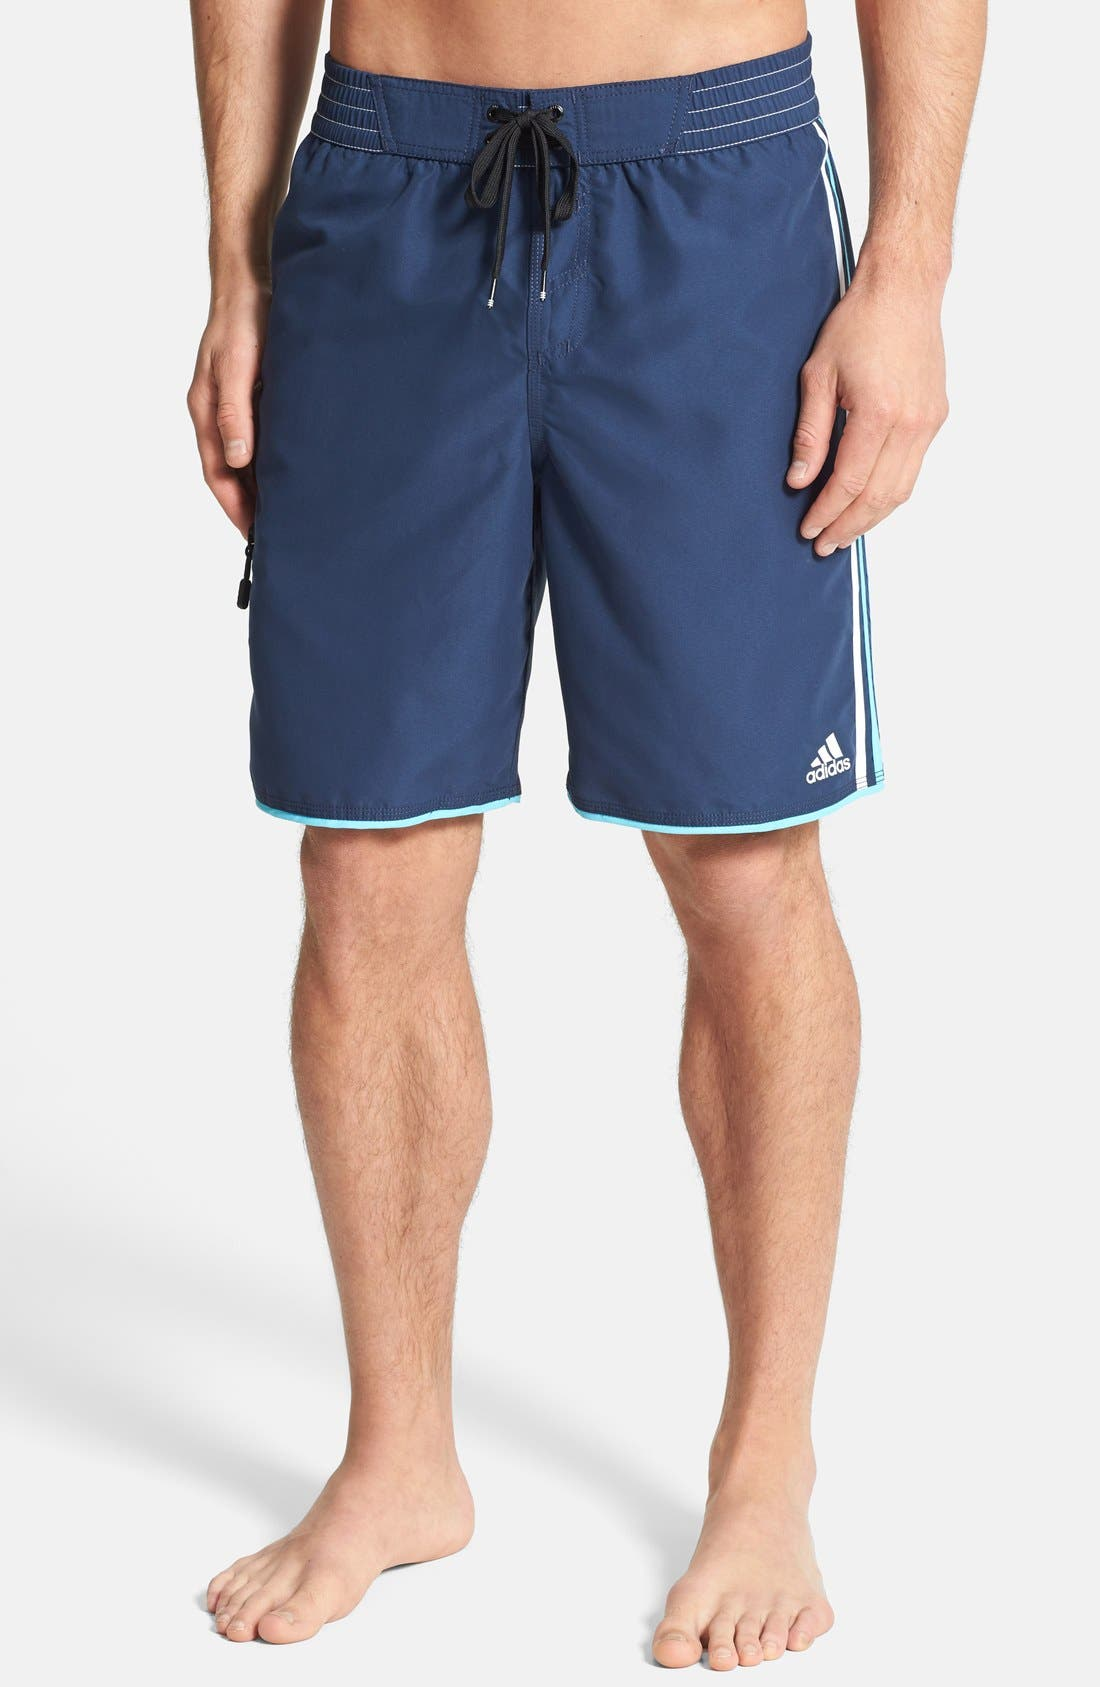 Main Image - adidas 'Core' Swim Trunks